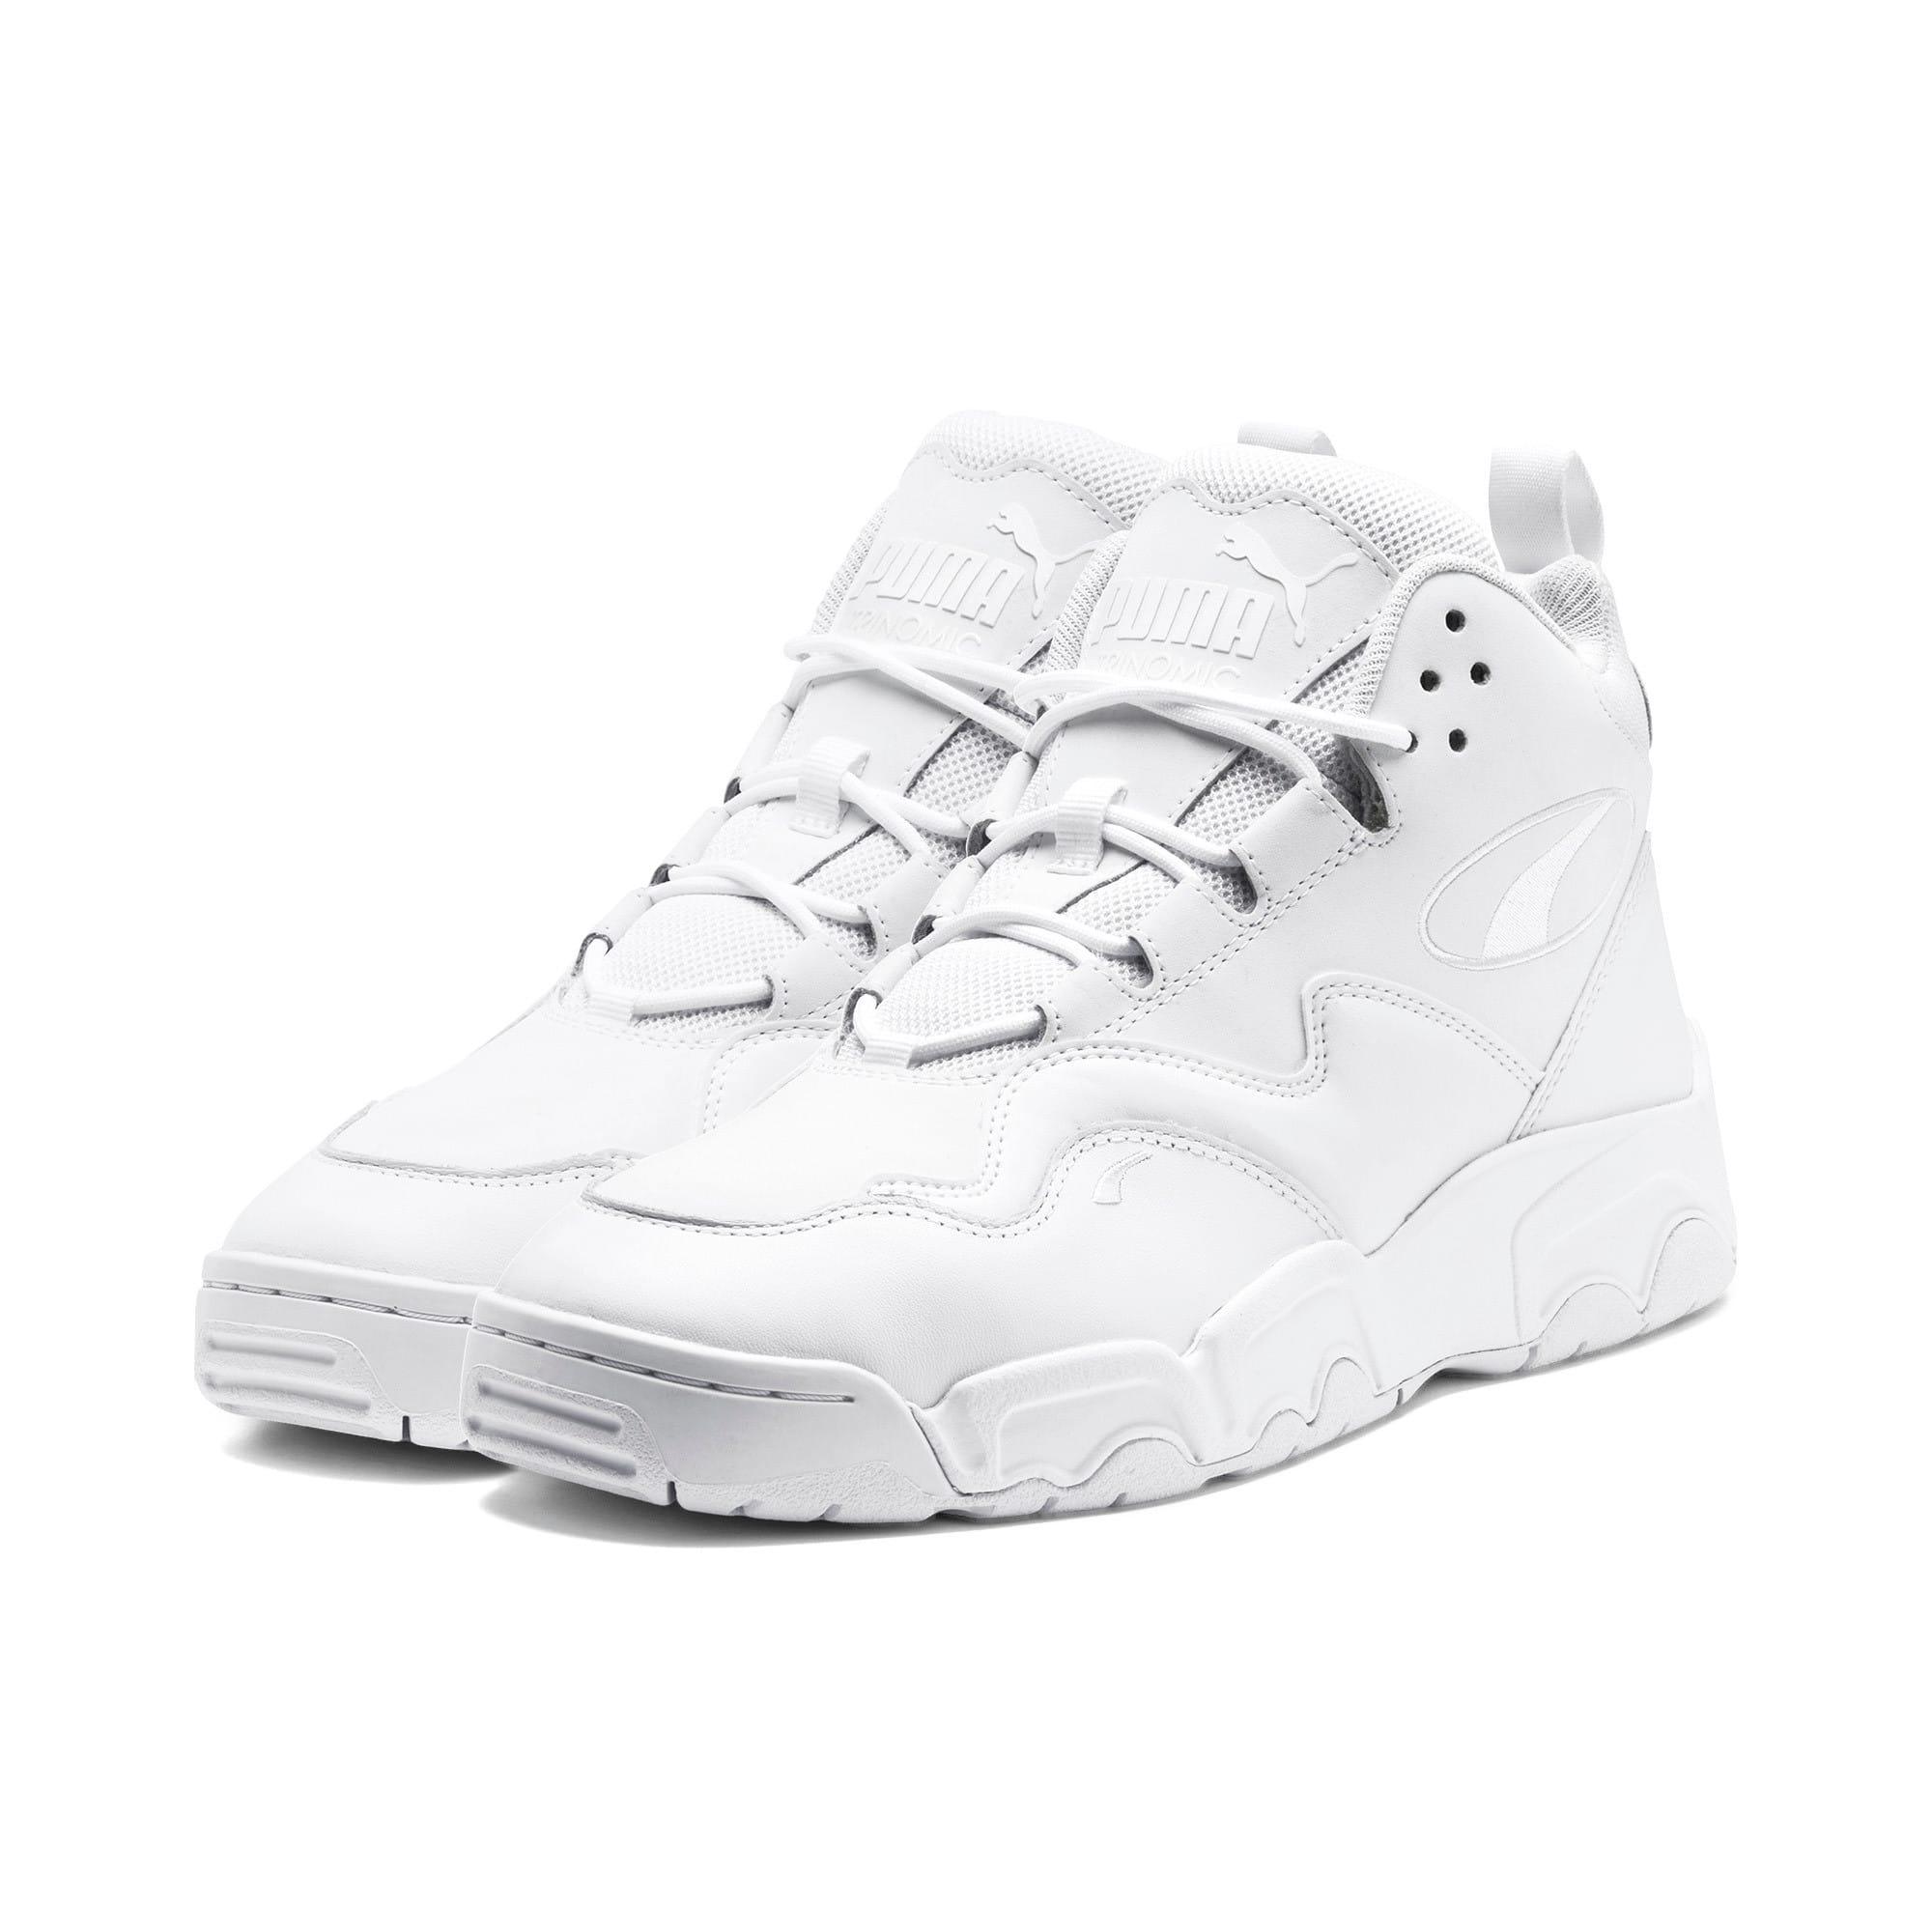 Thumbnail 2 of Source Mid Sneakers, Puma Black-Puma White, medium